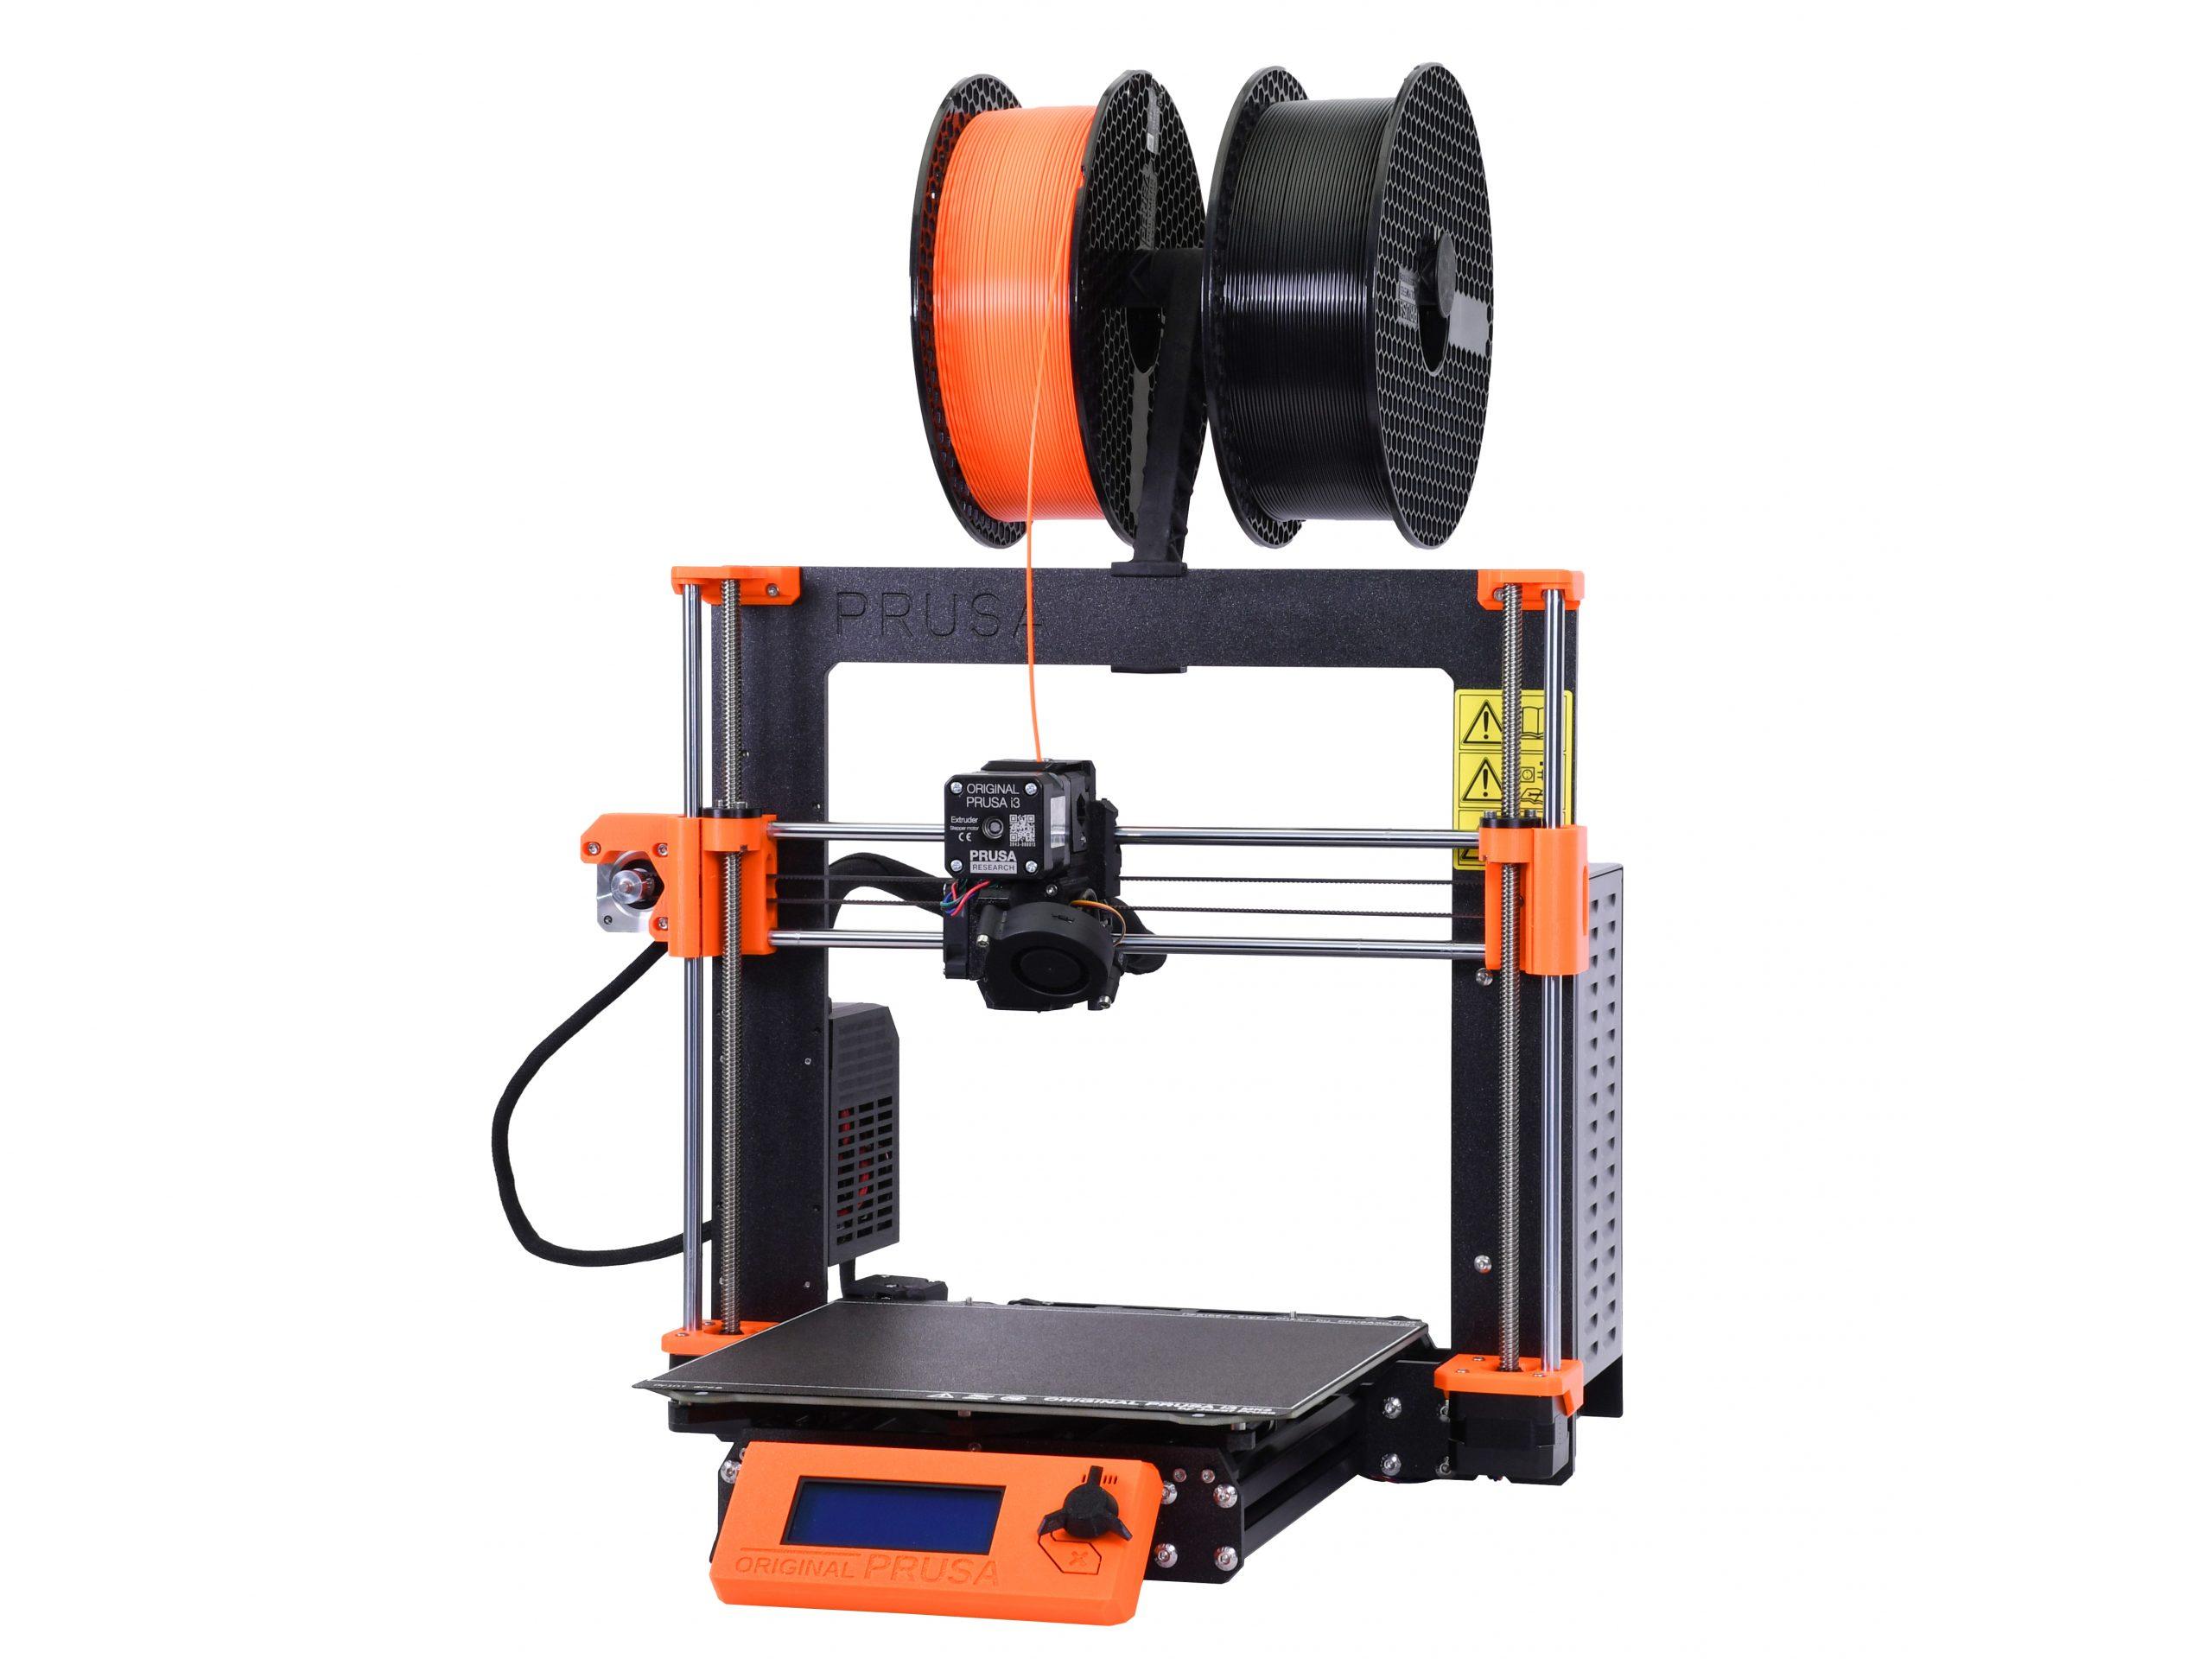 Original Prusa i3 MK3S Prusa Research - Imprimantes 3D